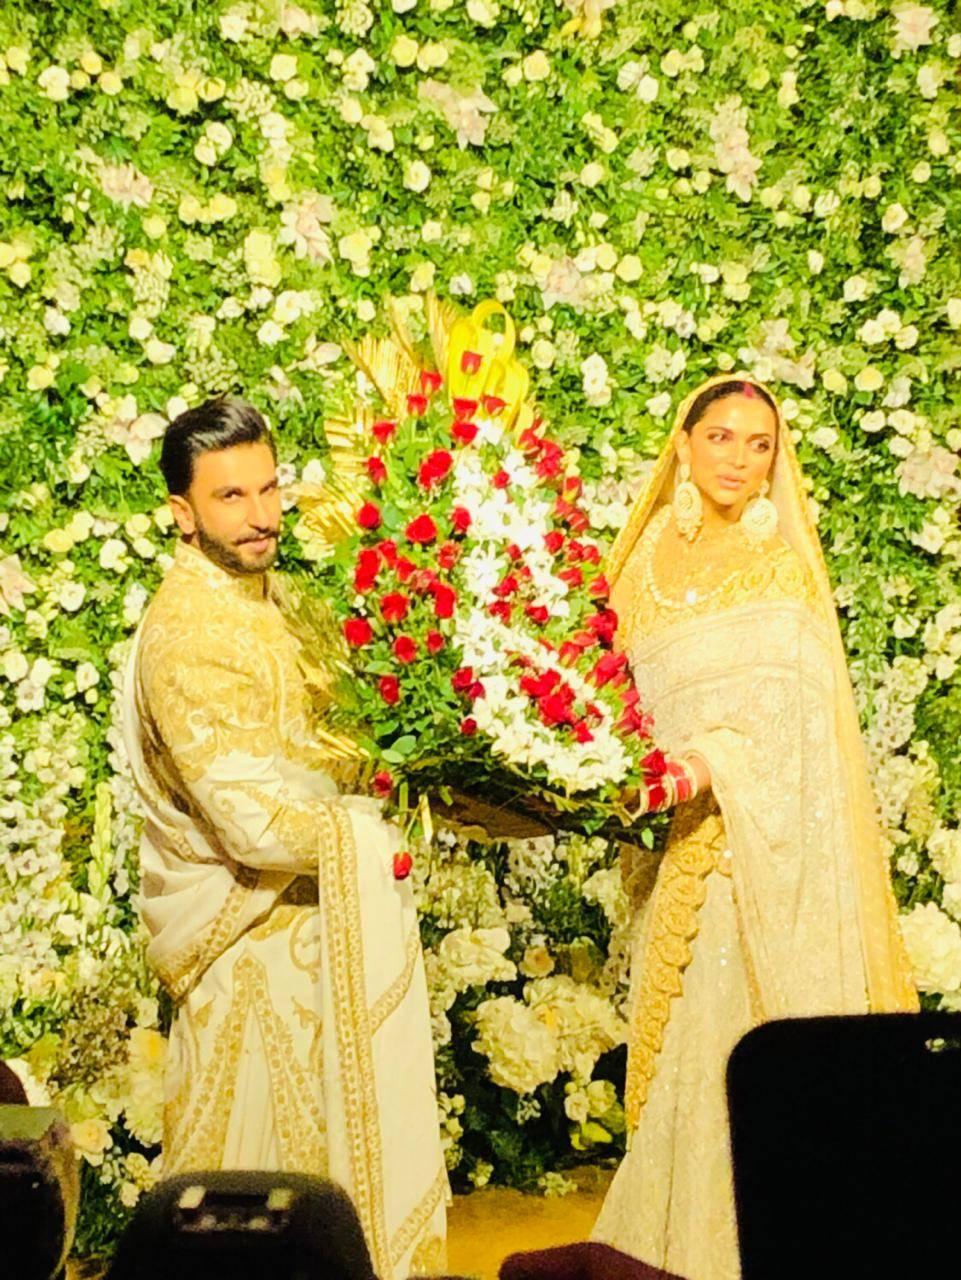 Deepika Padukone and Ranveer Singh Wedding Reception in Mumbai Photos and Videos